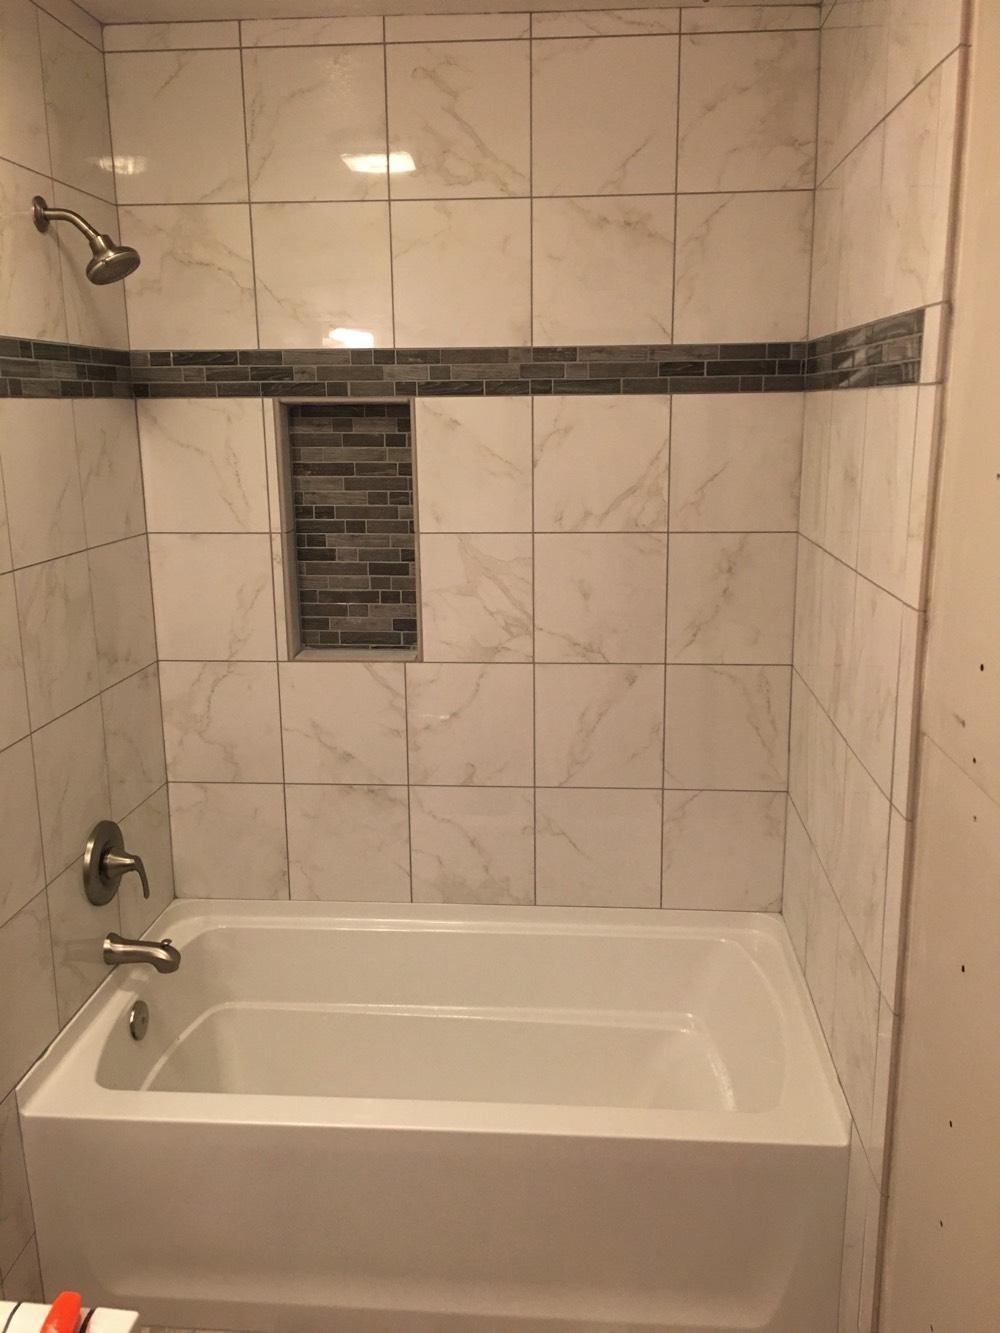 Bathtub Area Remodeling